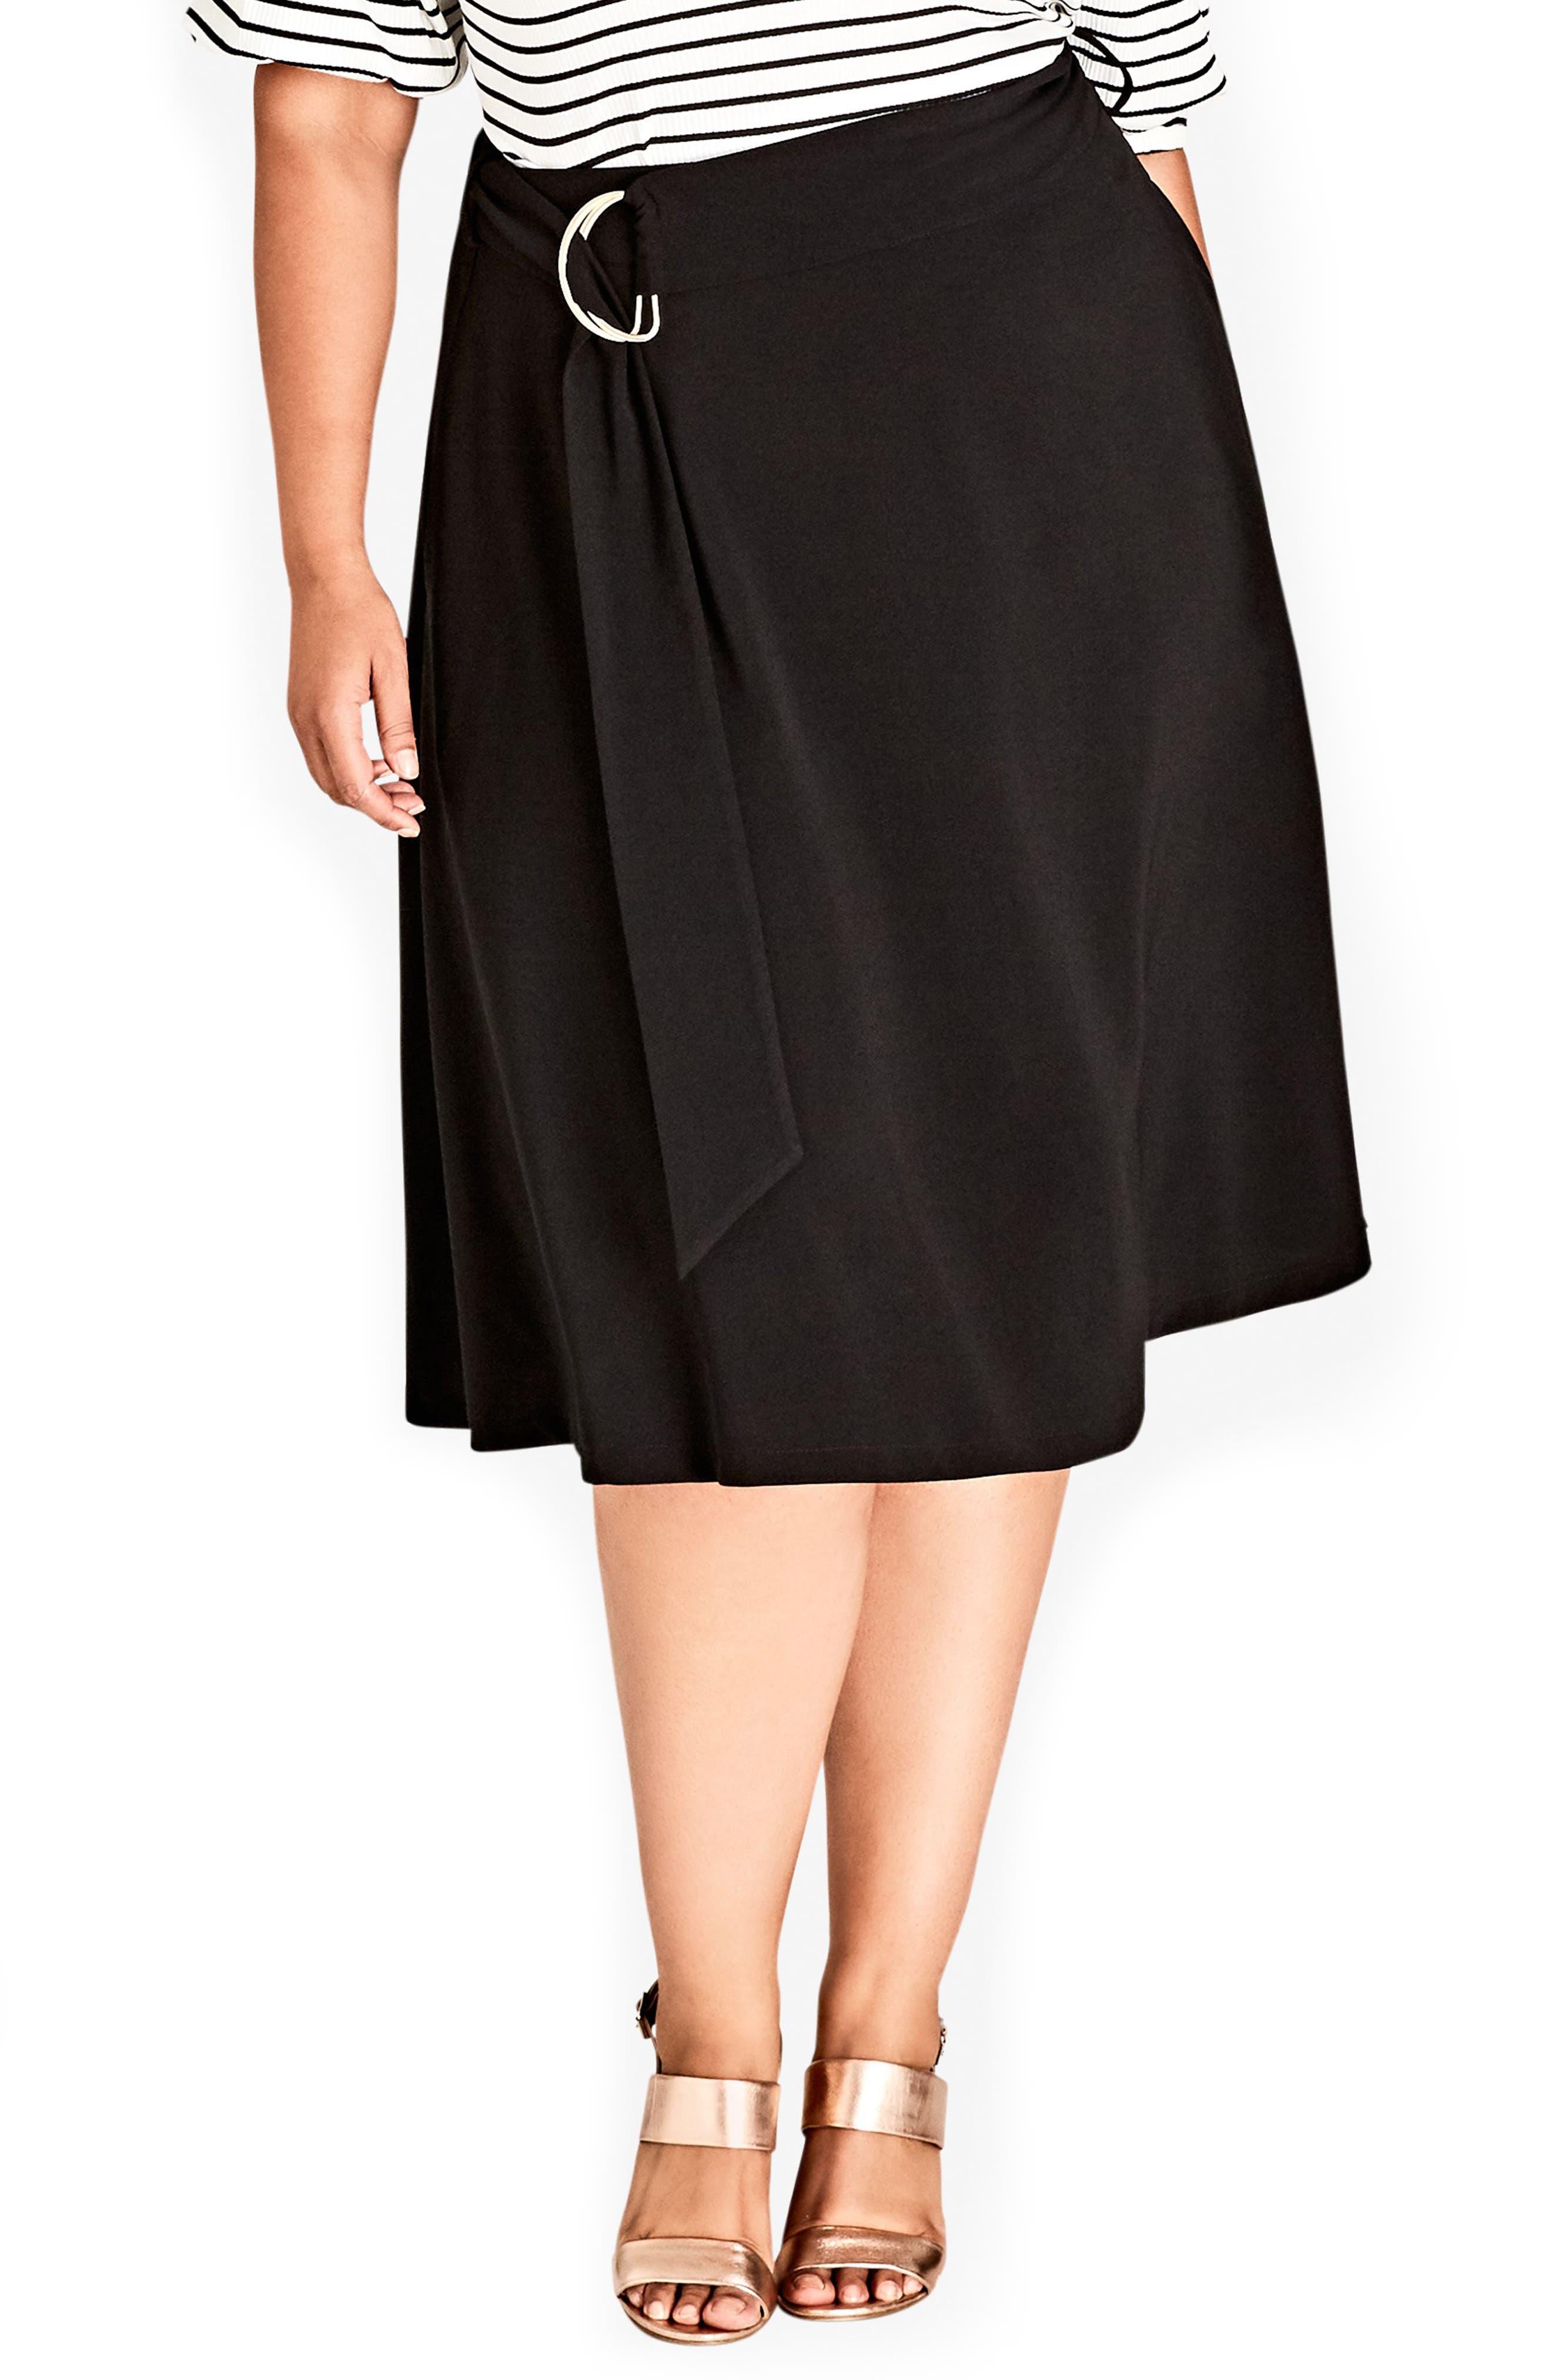 Joyful A-Line Skirt,                         Main,                         color, BLACK